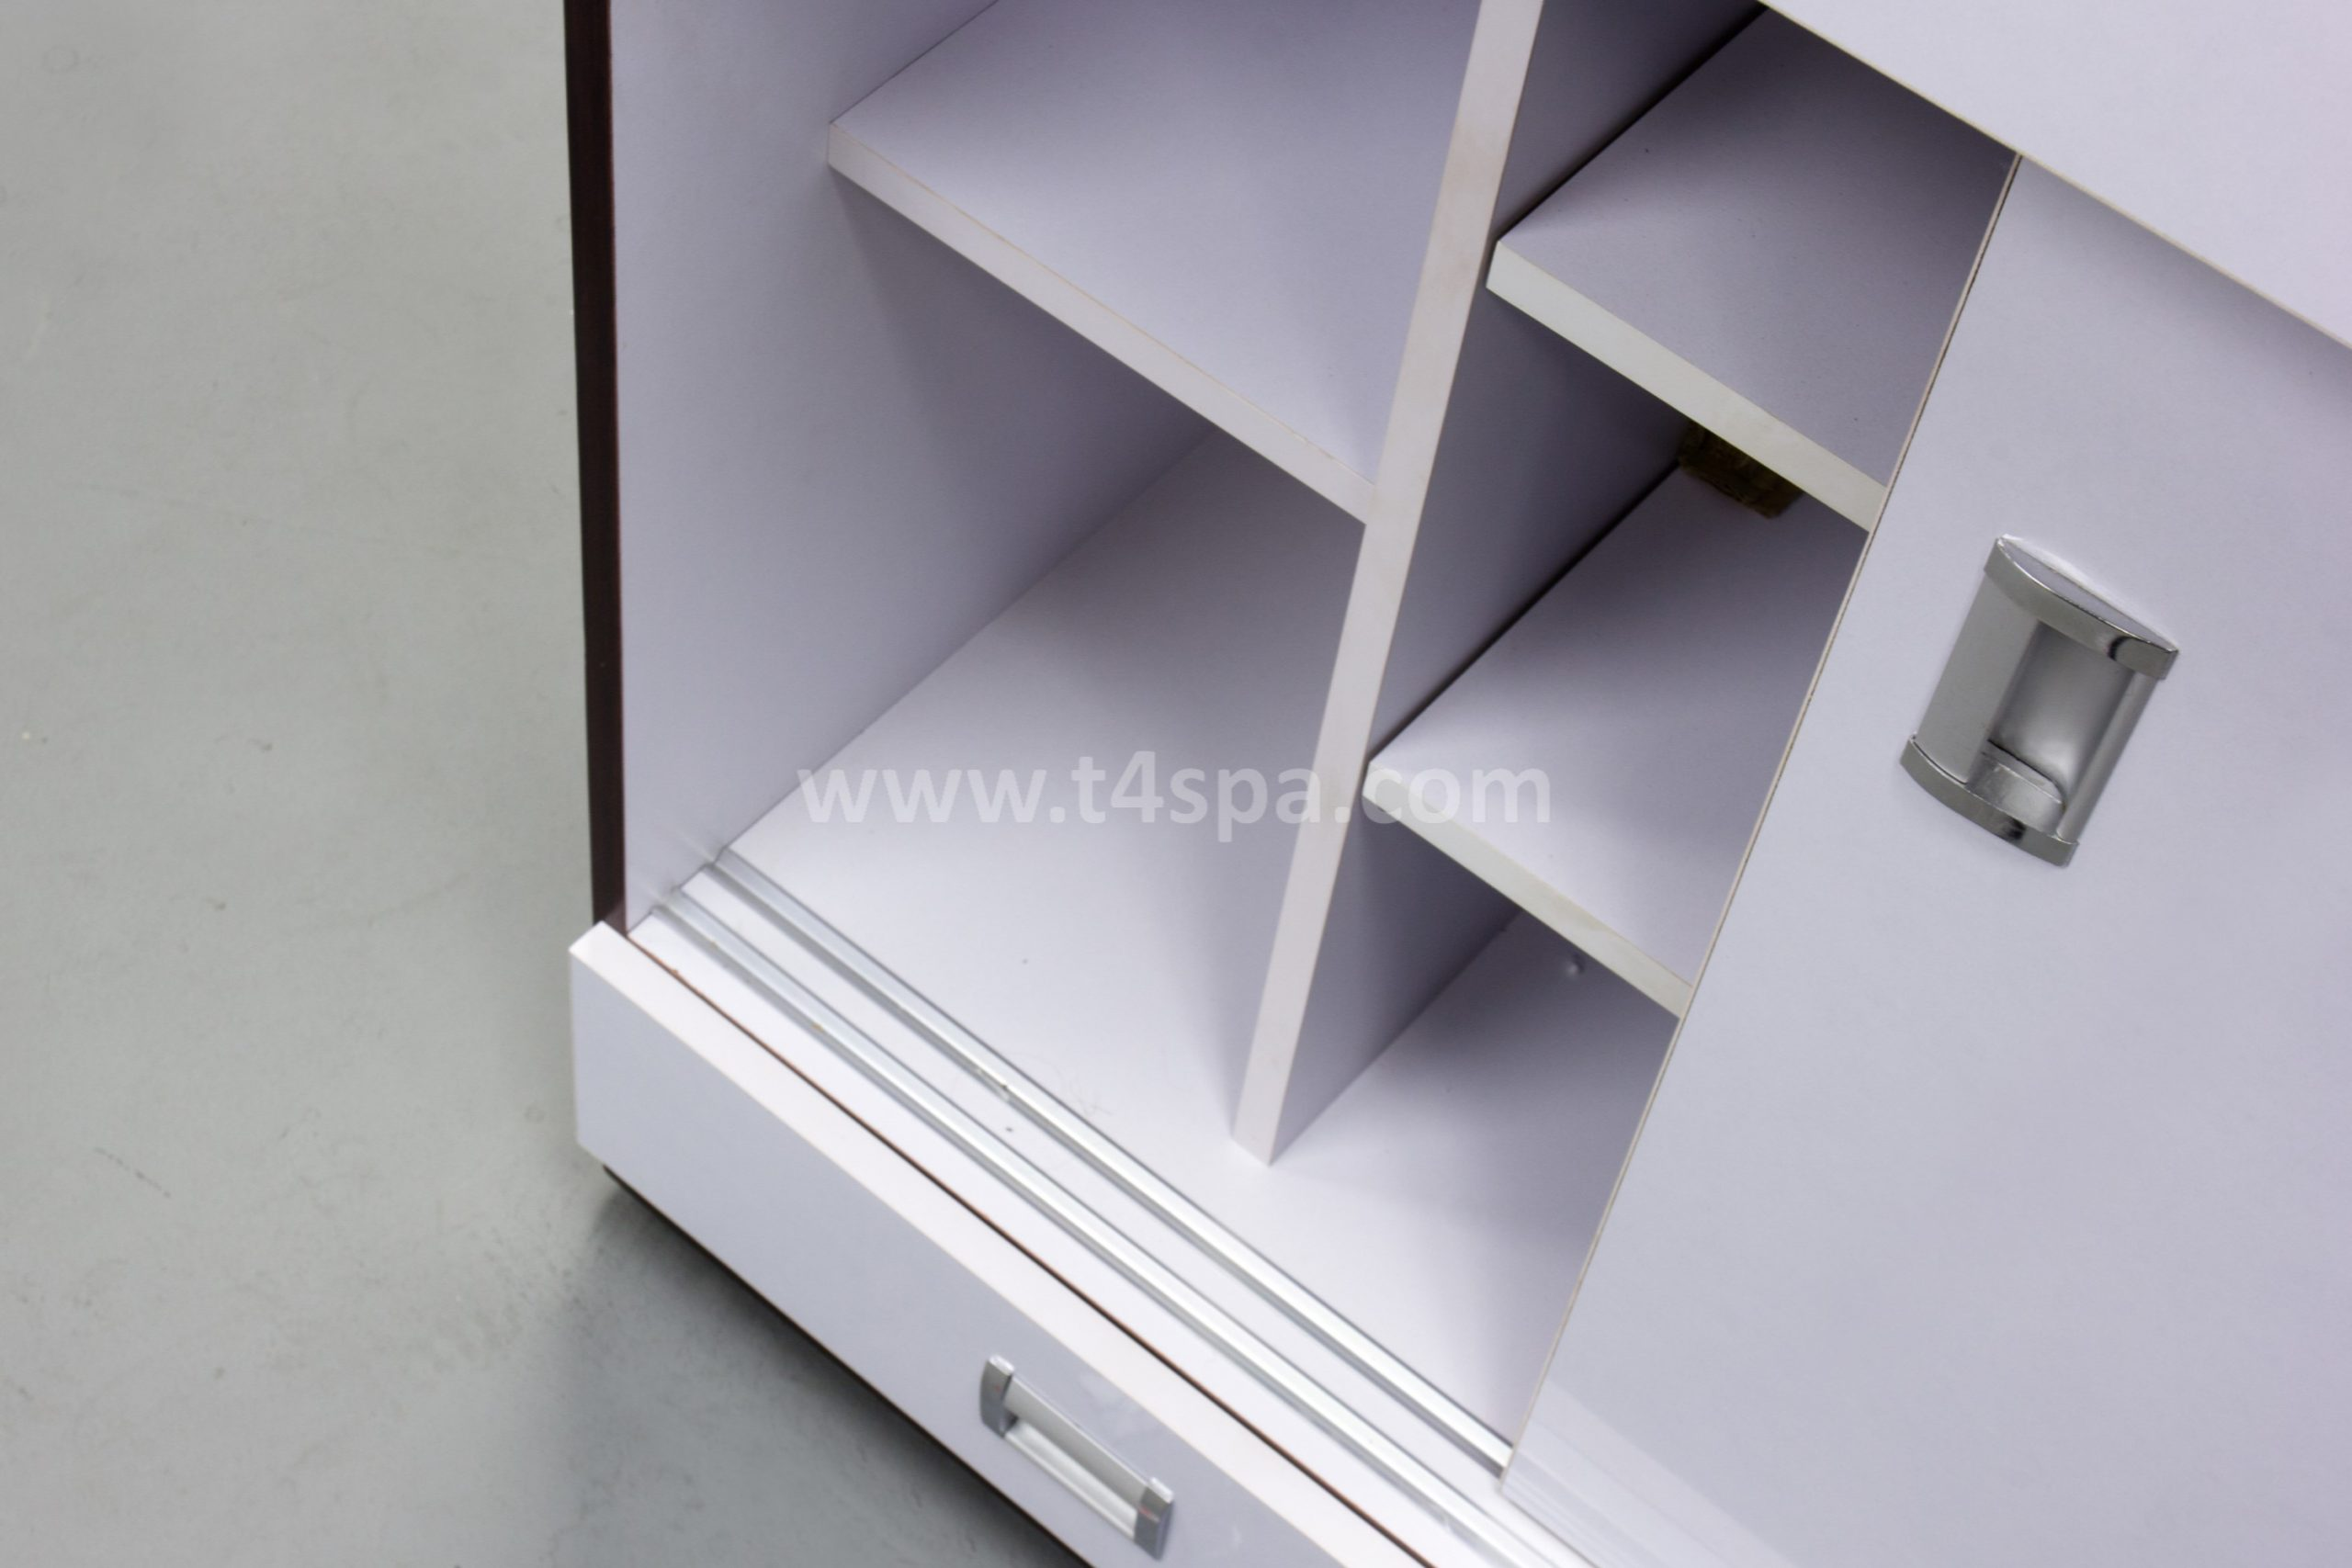 TD-357 Reception Glossy White + Dark Wood Detail (2)